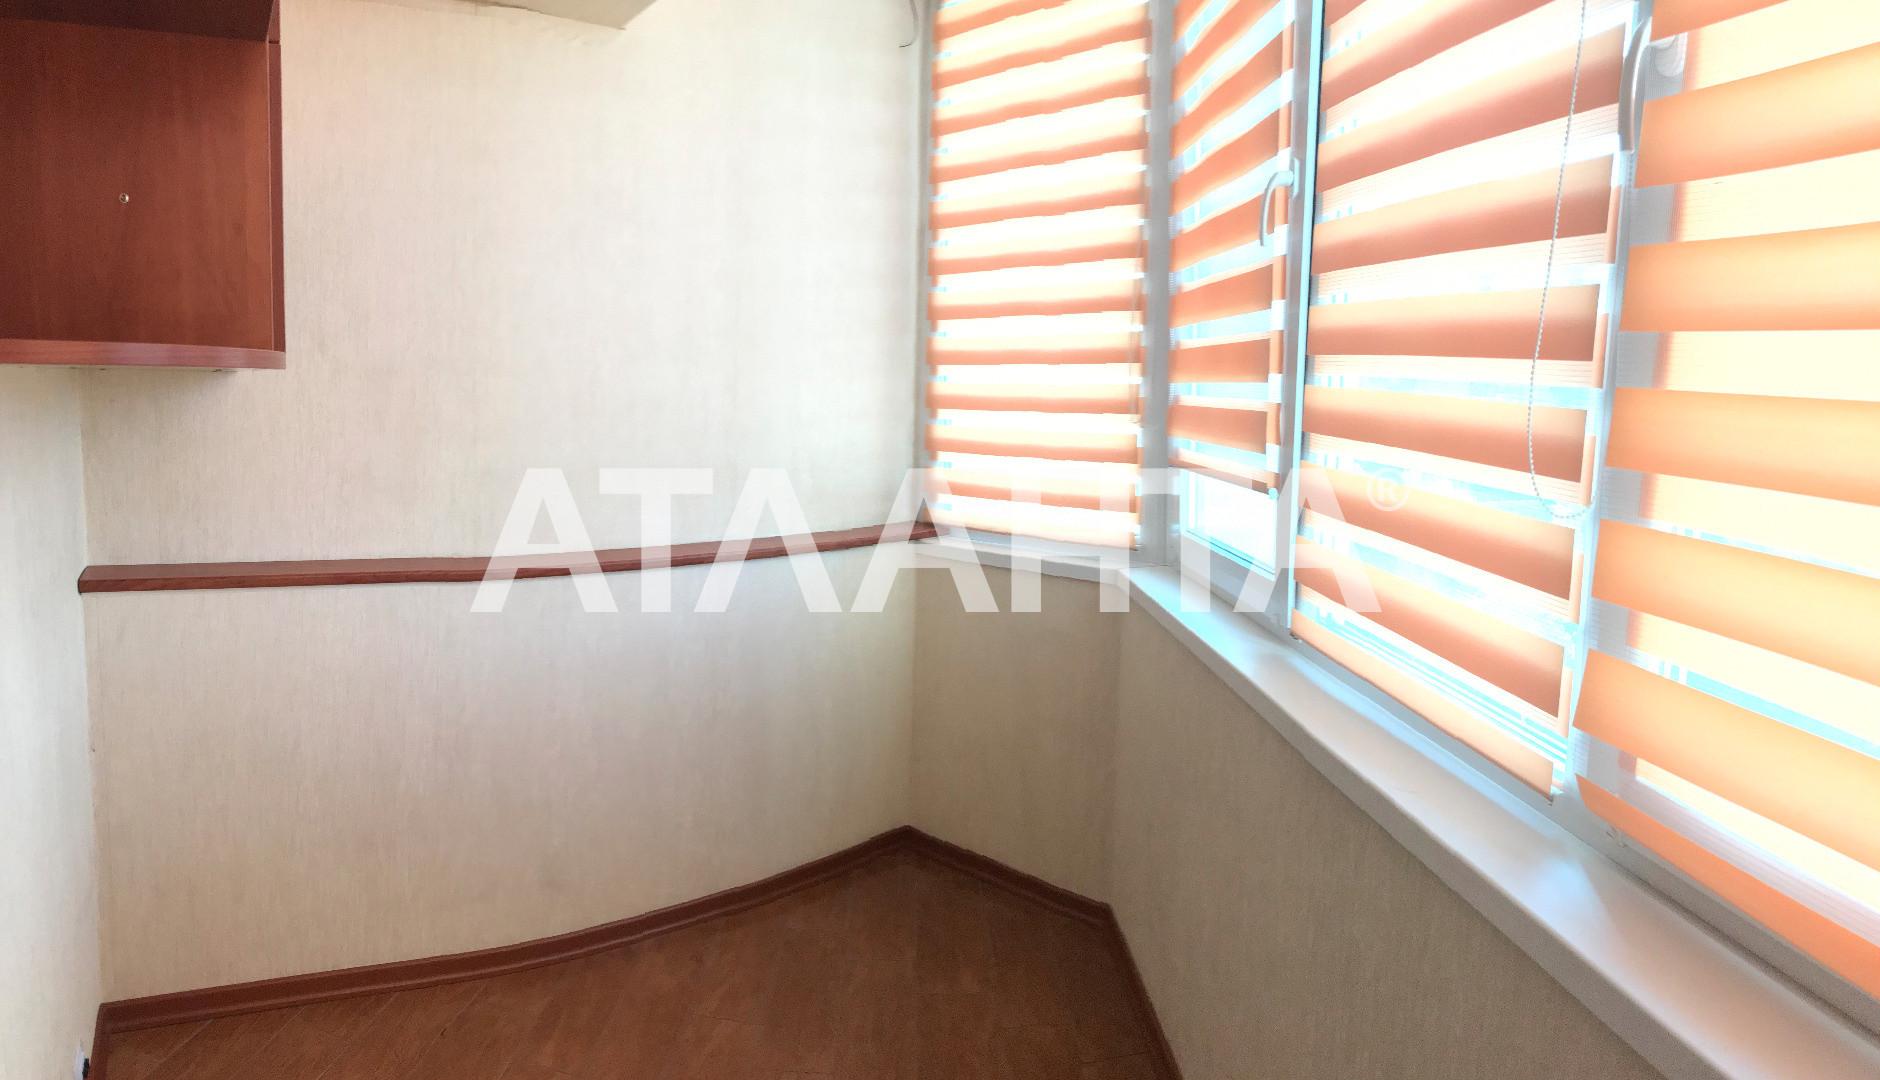 Продается 3-комнатная Квартира на ул. Ул. Ломоносова — 135 000 у.е. (фото №14)